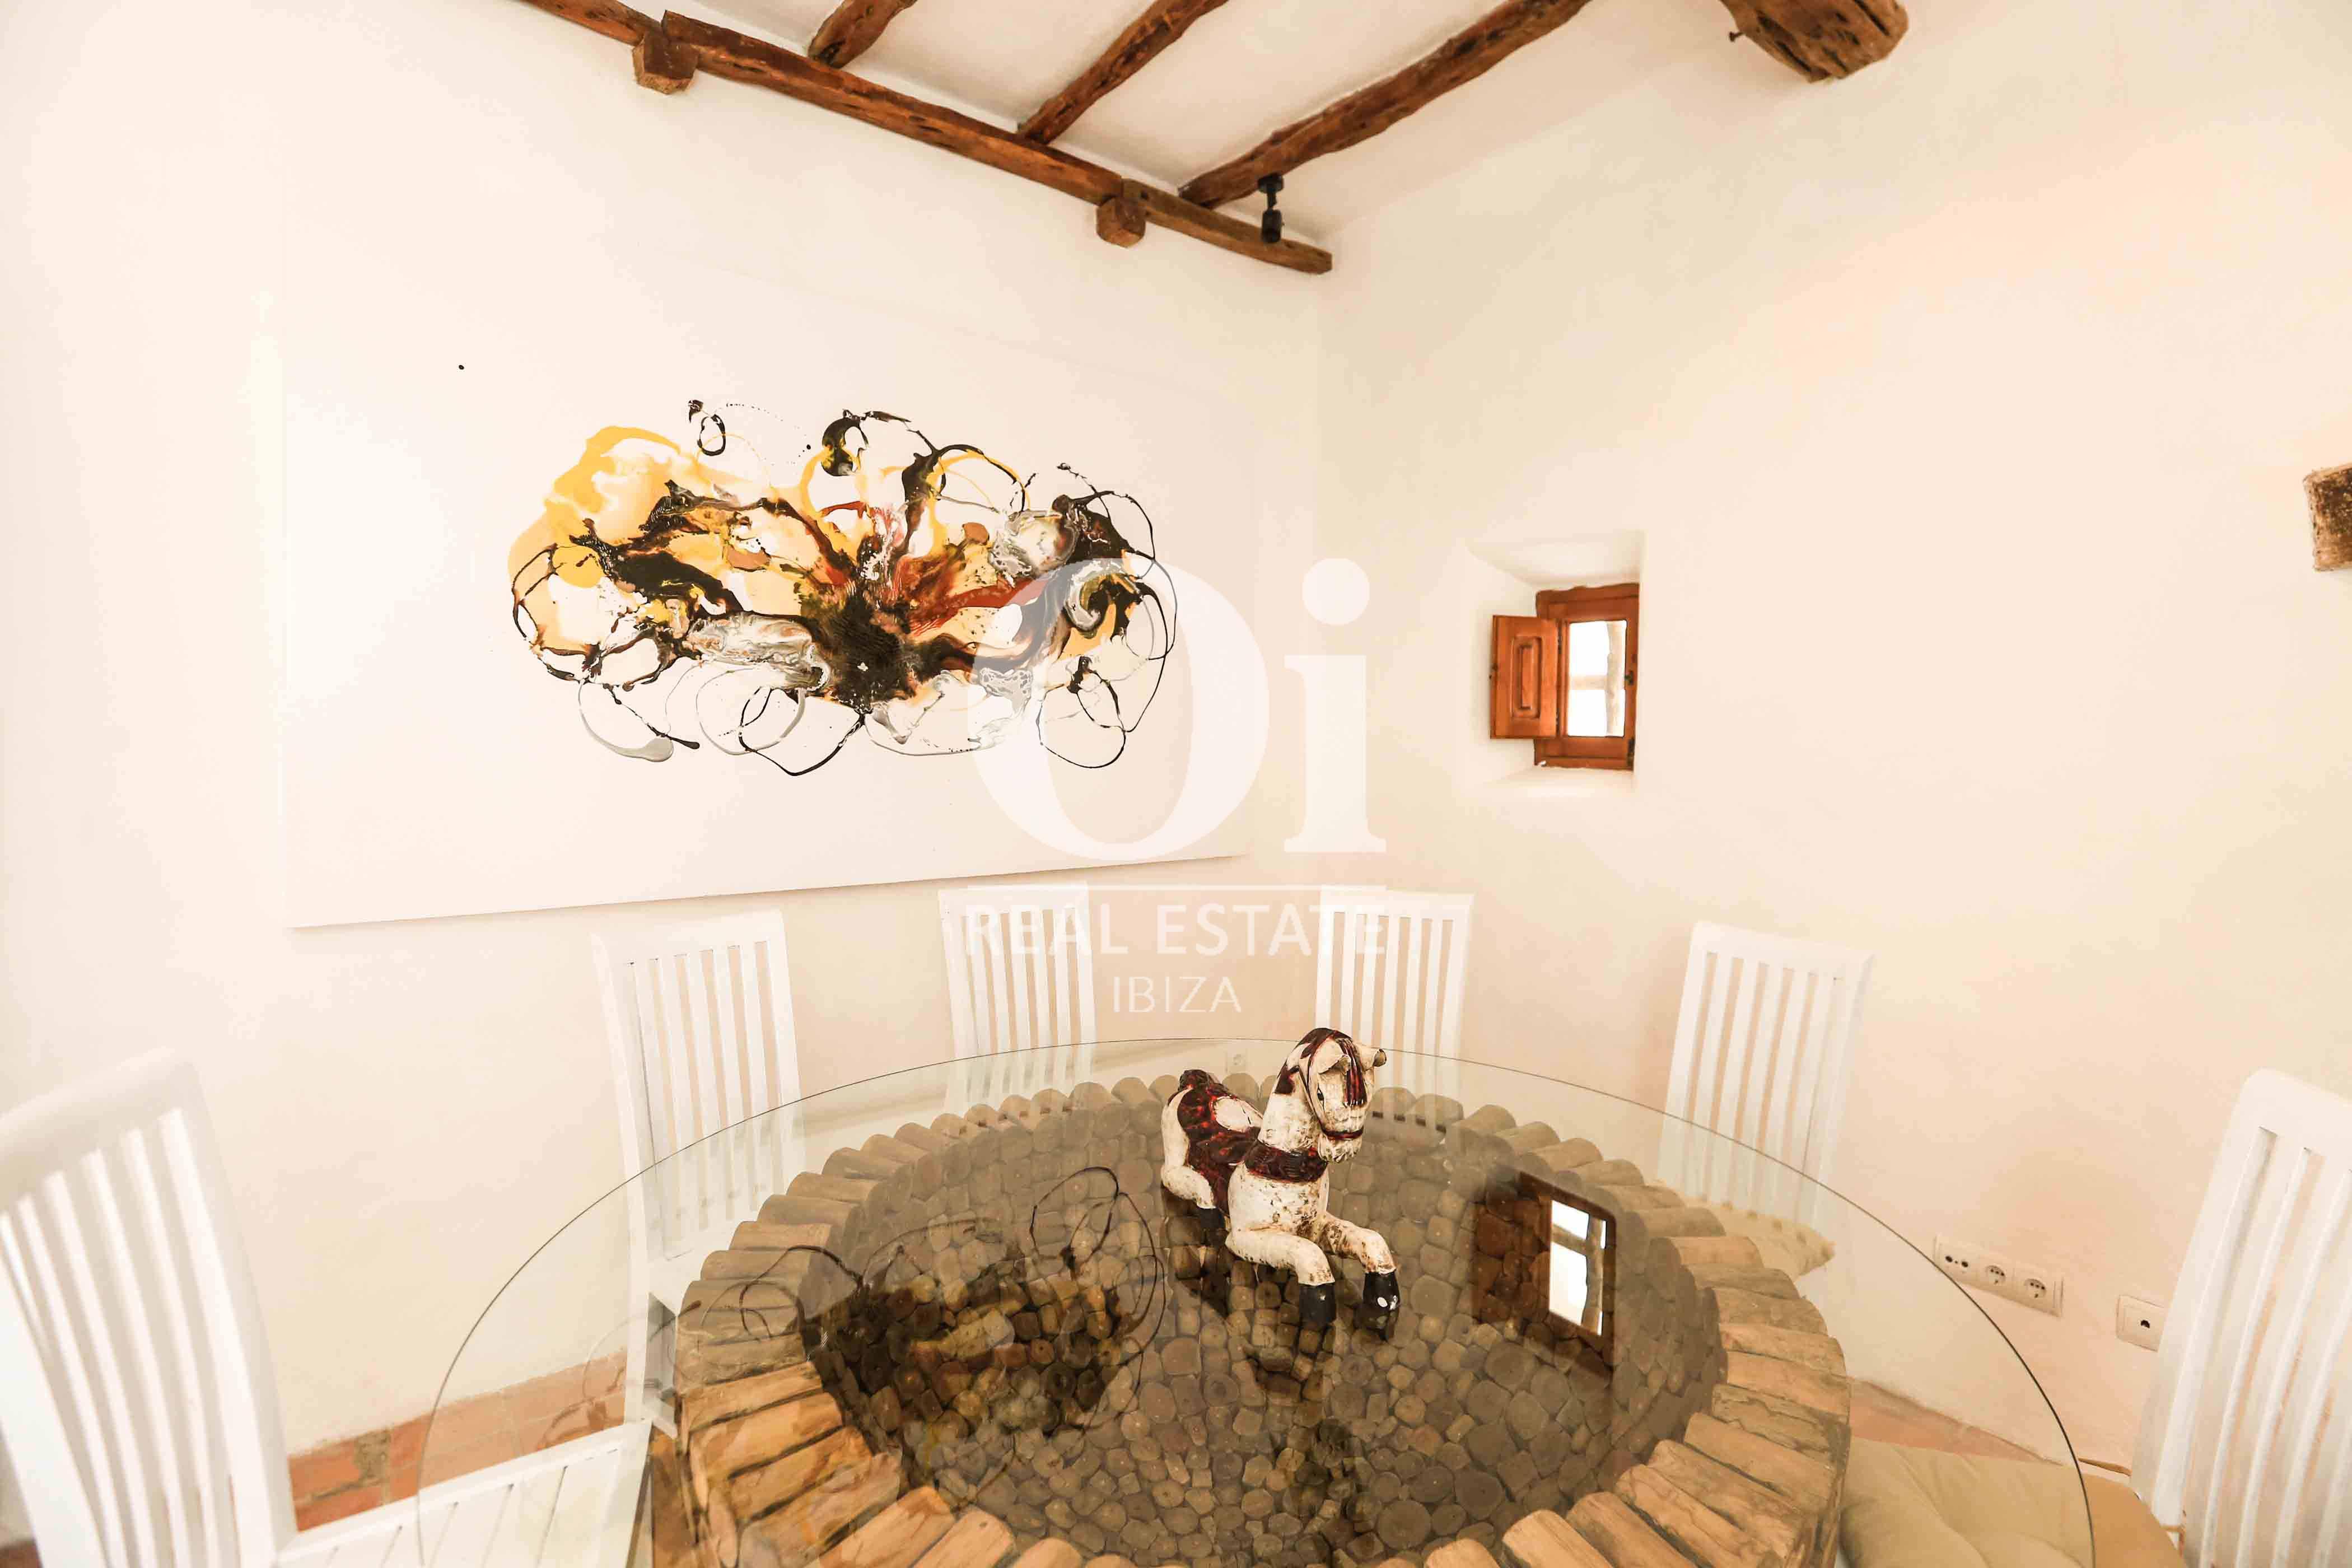 Comedor de casa en alquiler vacacional en zona Puig d'en Valls, Ibiza